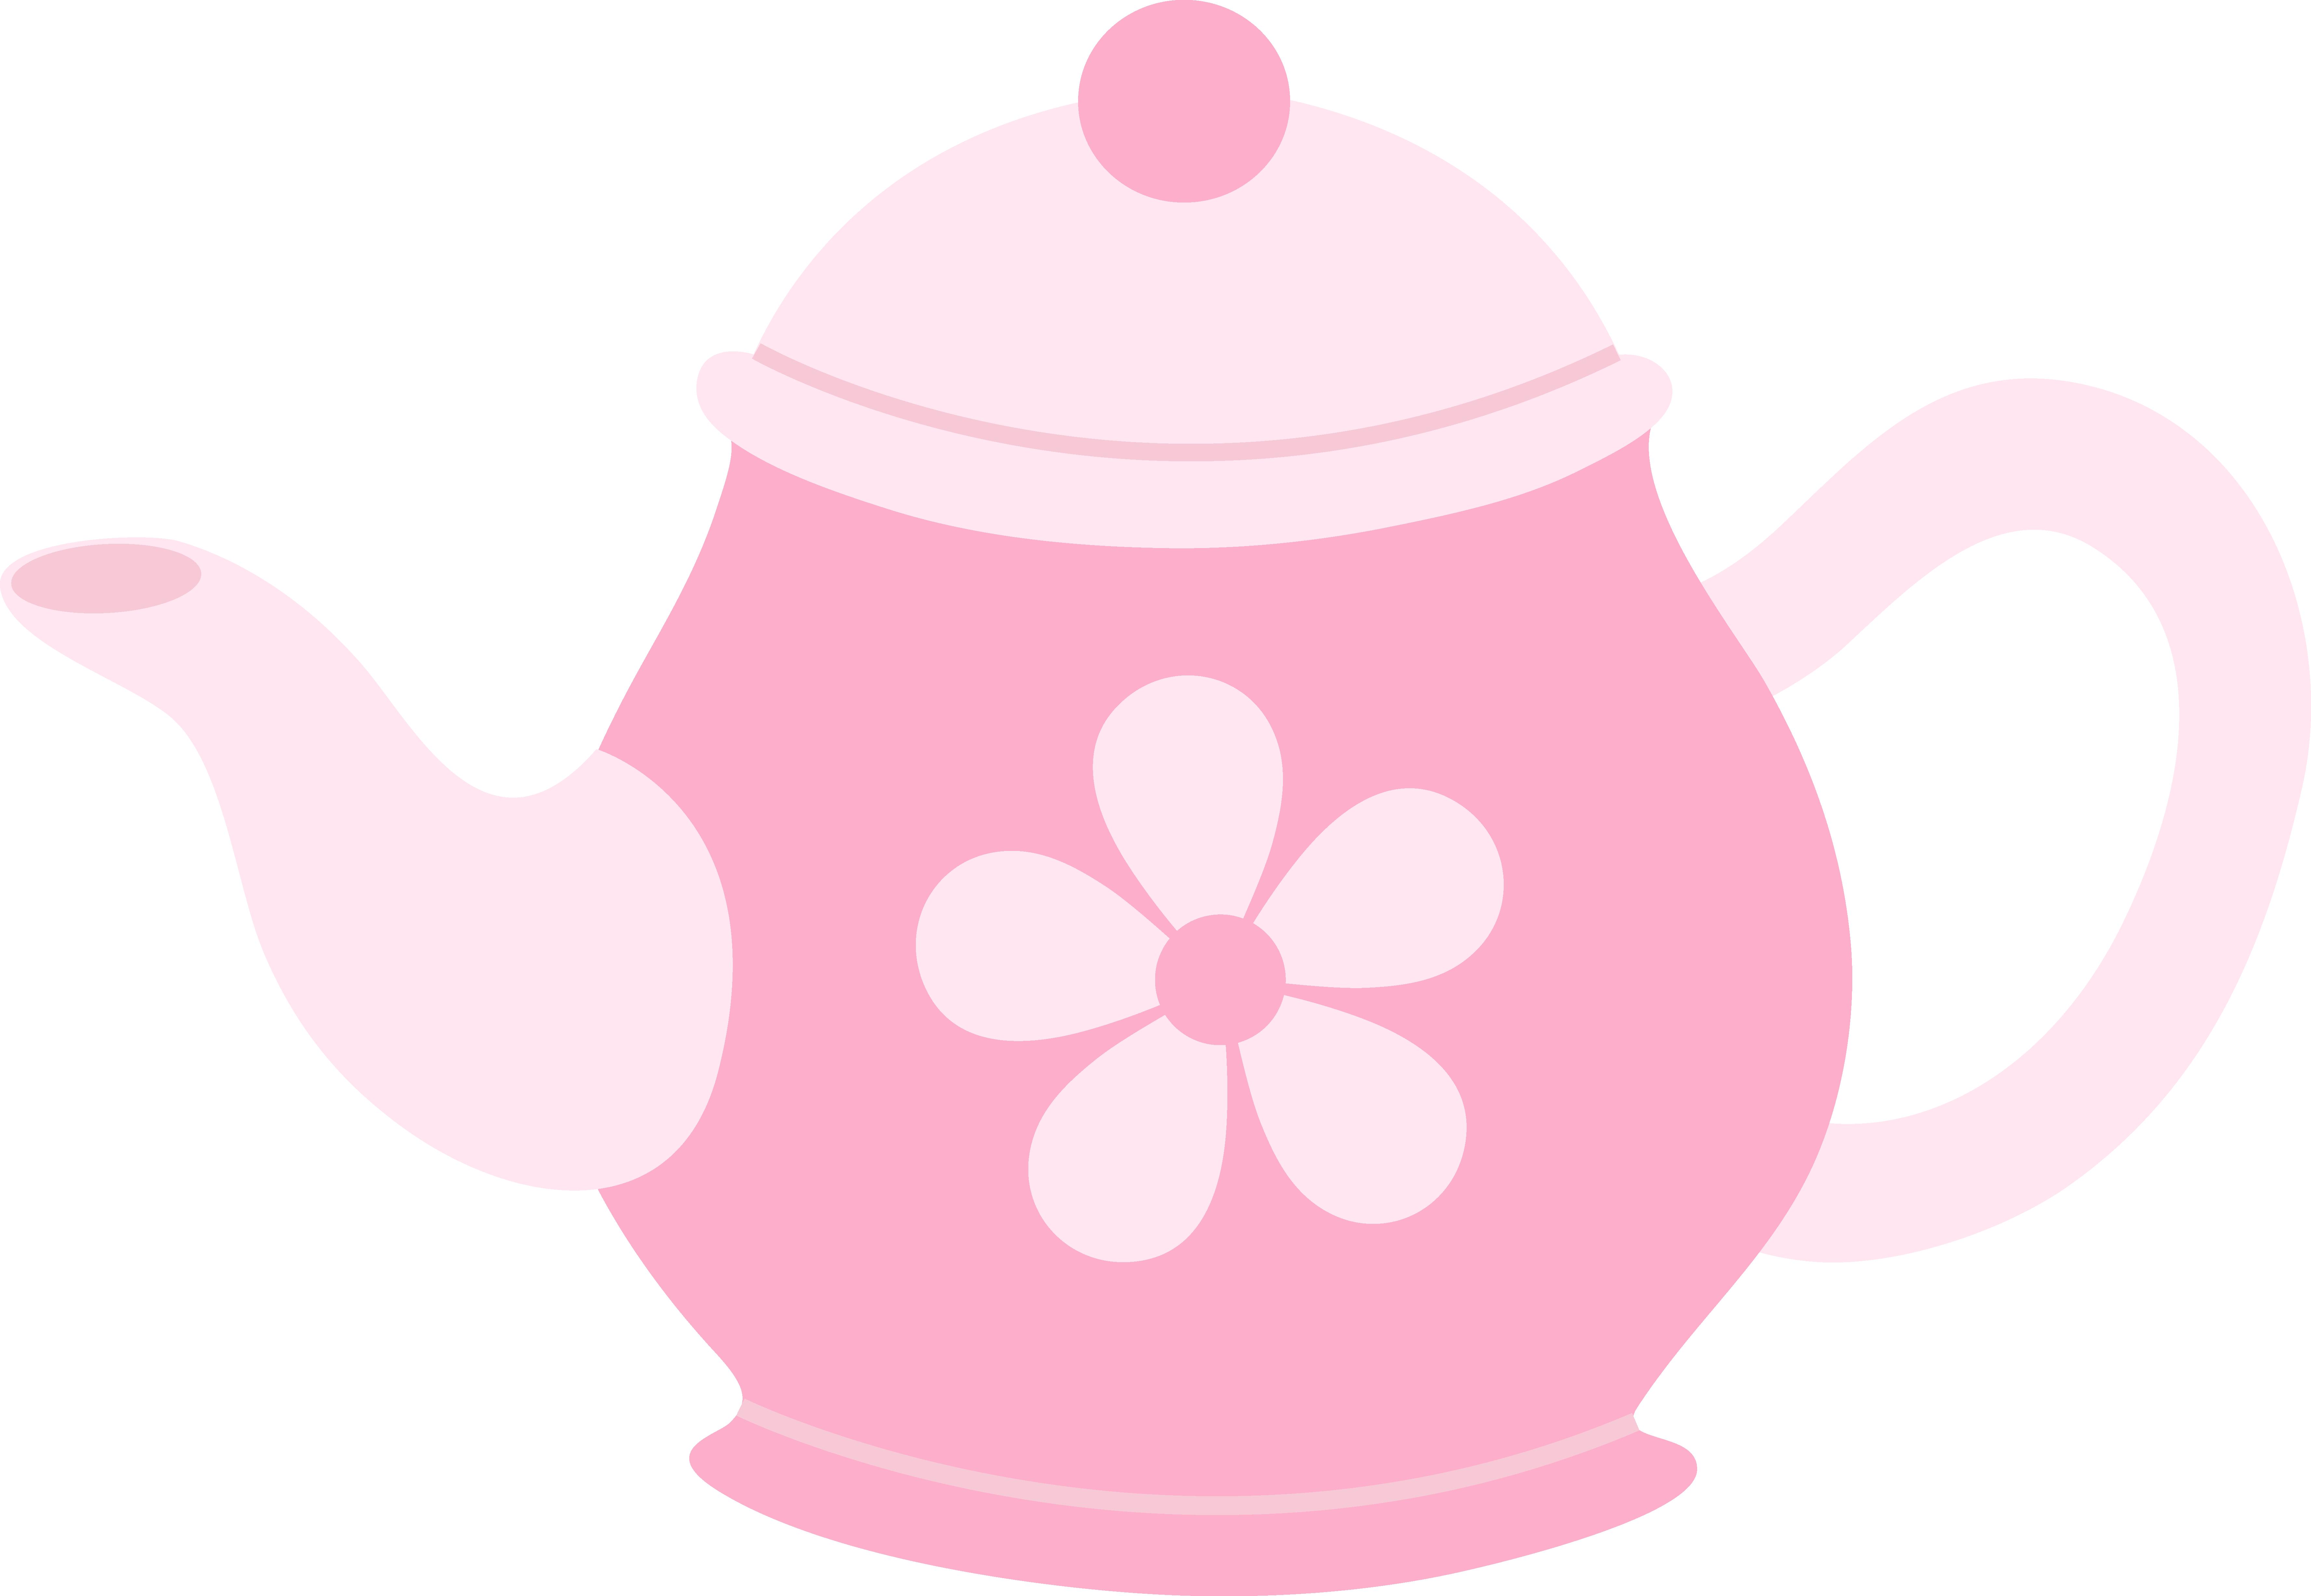 7108x4910 Teapot Tea Pot Clipart 5